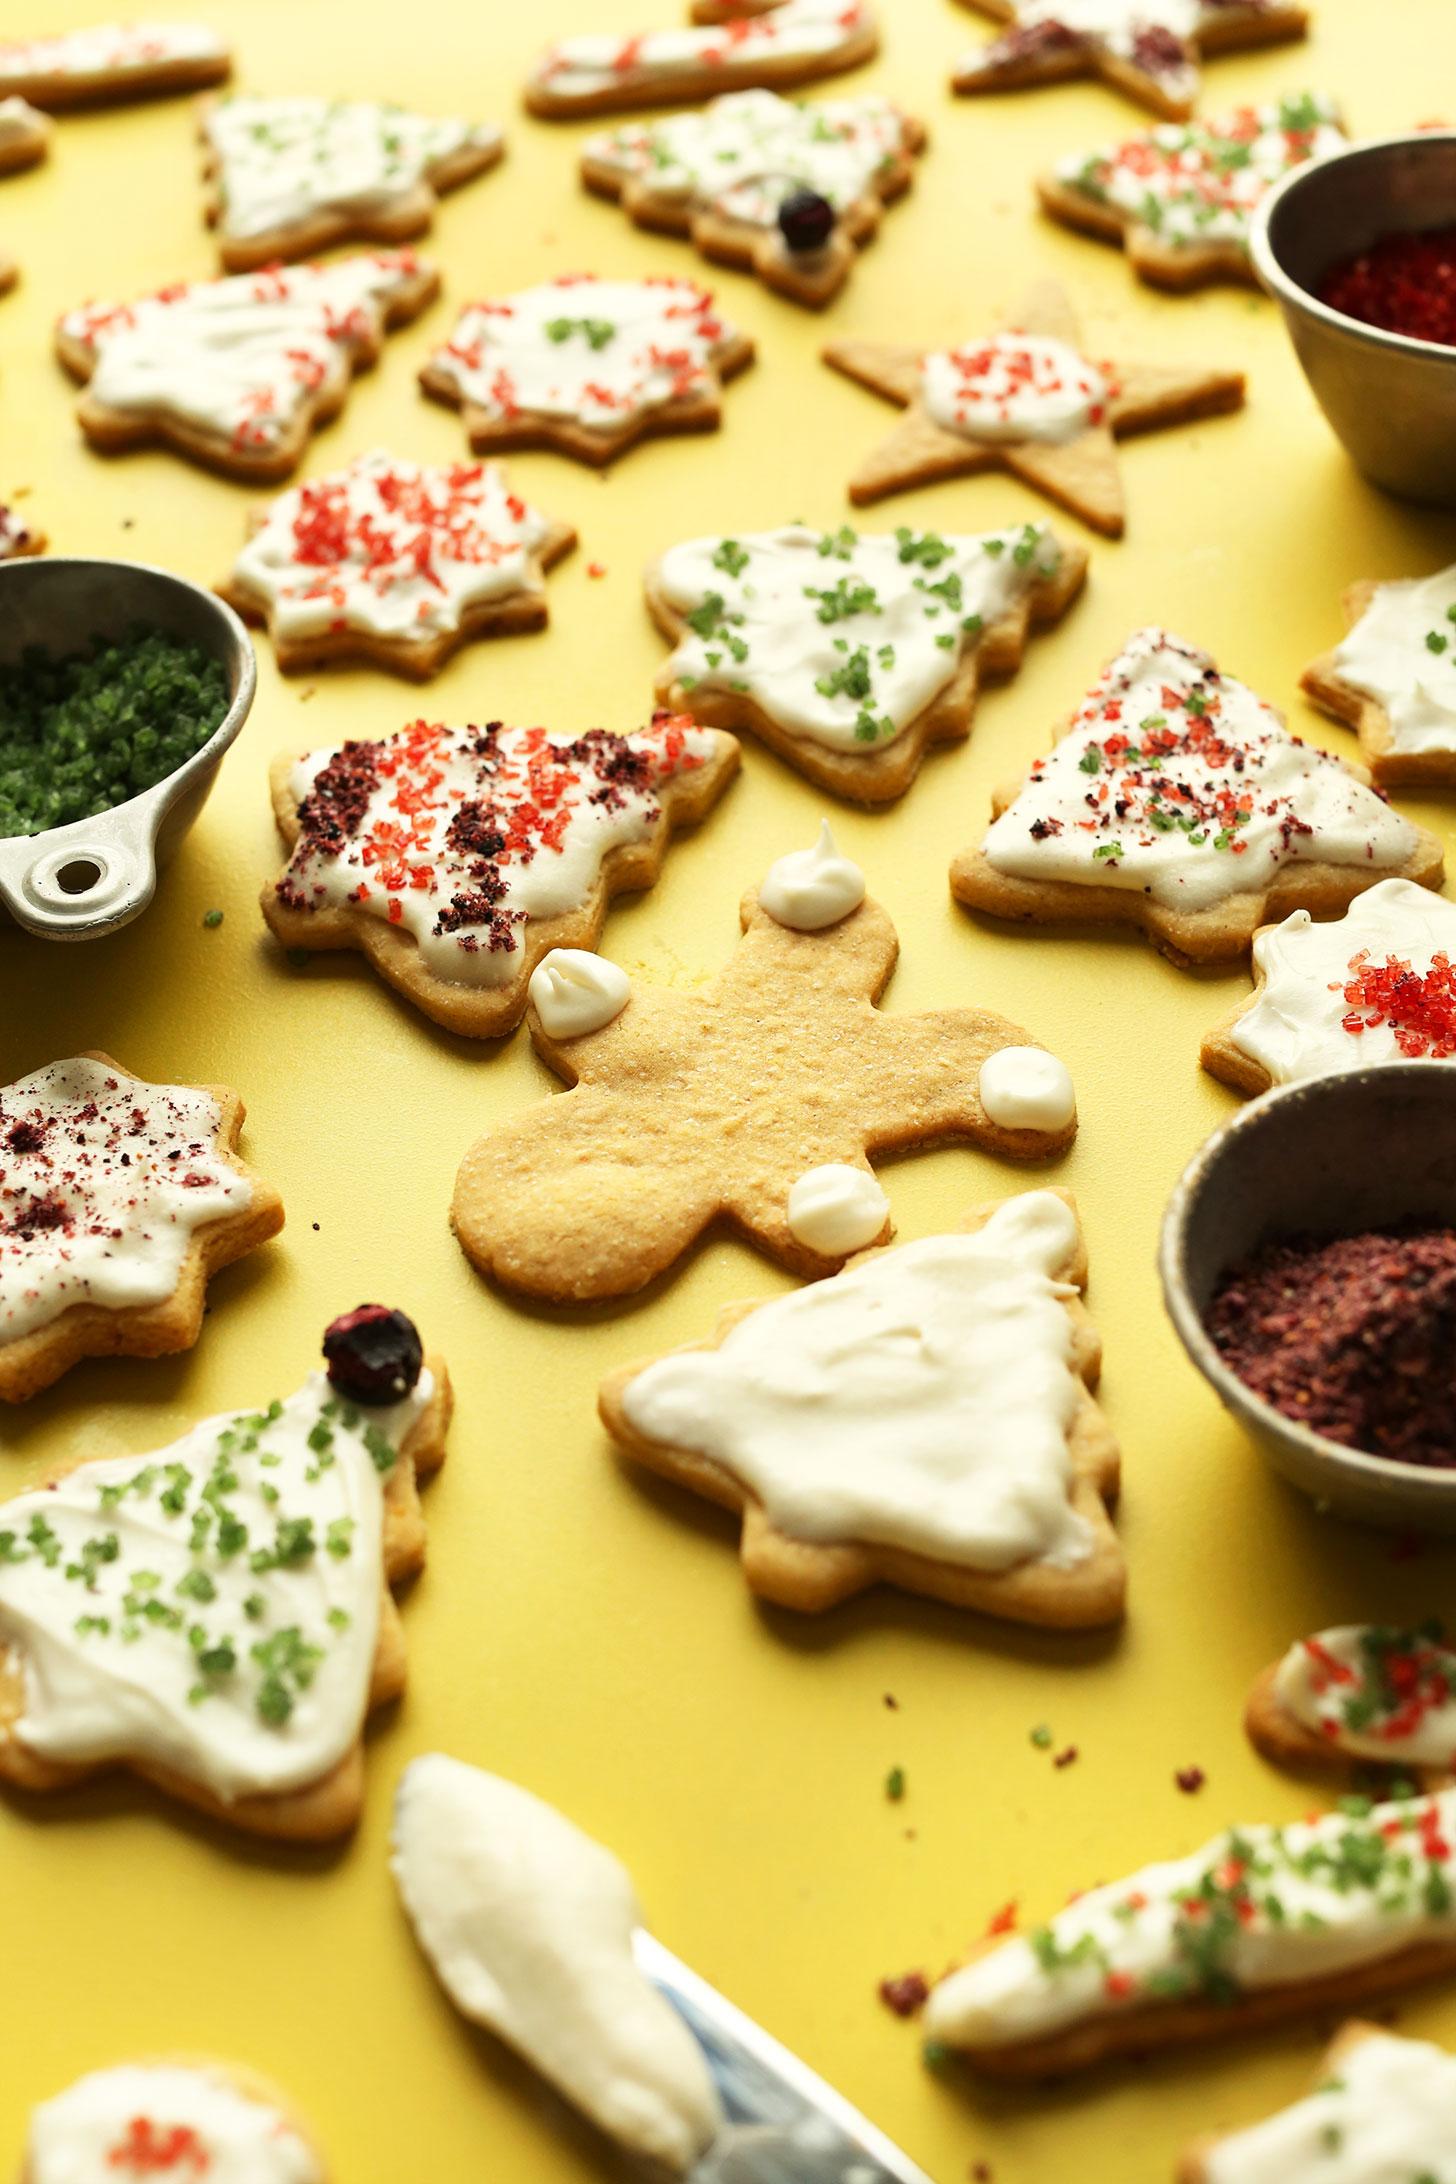 Vegan Gluten Free Sugar Cookie Recipe | Flo and Grace |Sugar Free Cookie Recipes